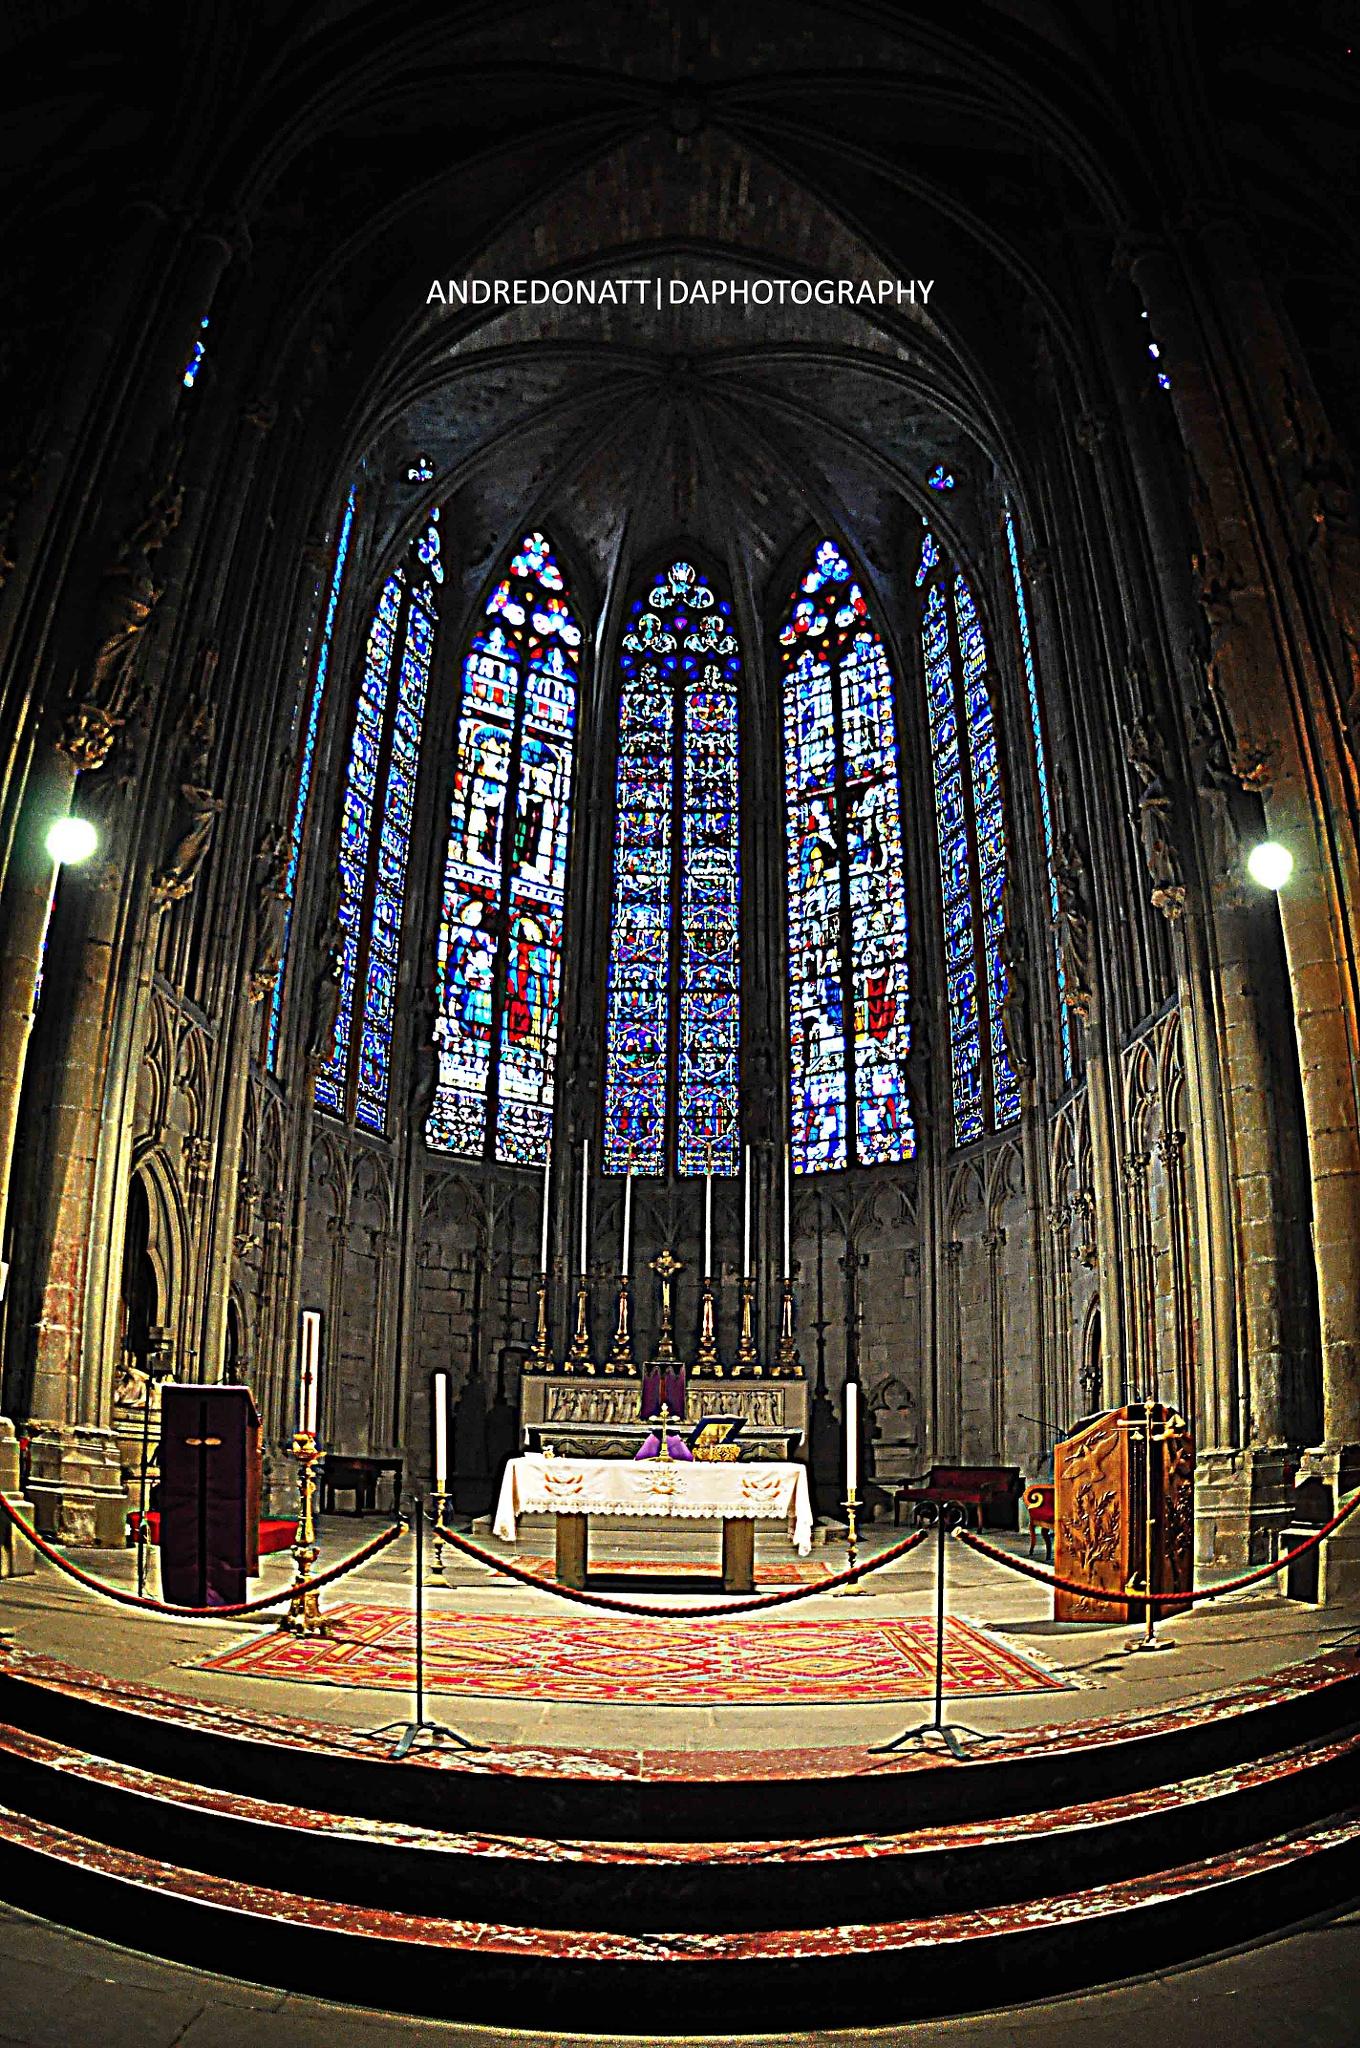 Cite de Carcassonne - Catedral by Andre Donatt